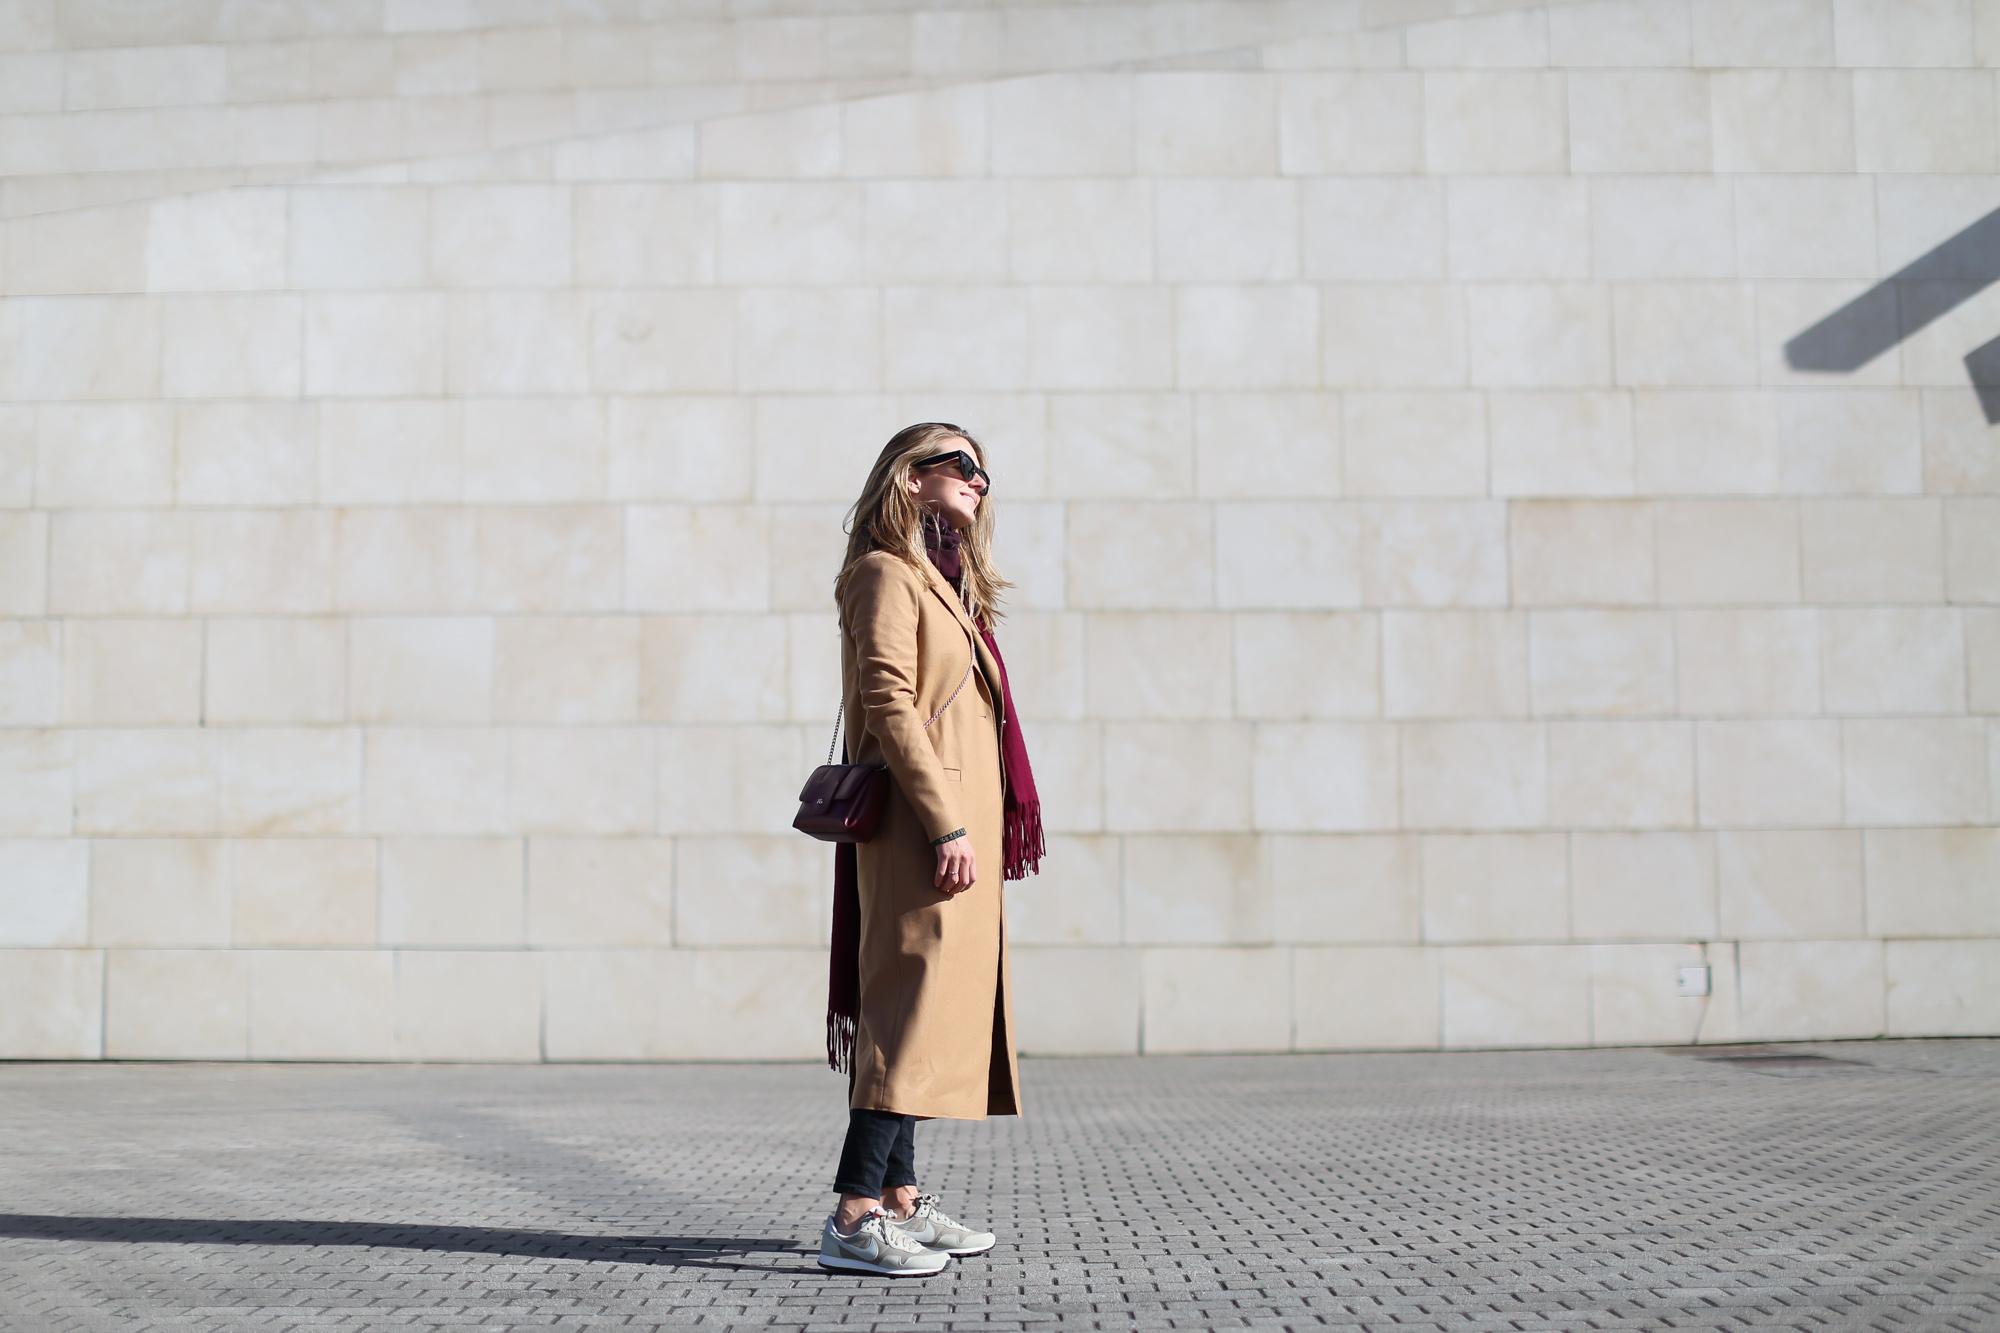 Clochet_streestyle_fashionblogger_&otherstories_abrigocamel_nikepegasus_topshopjamiejeans-2